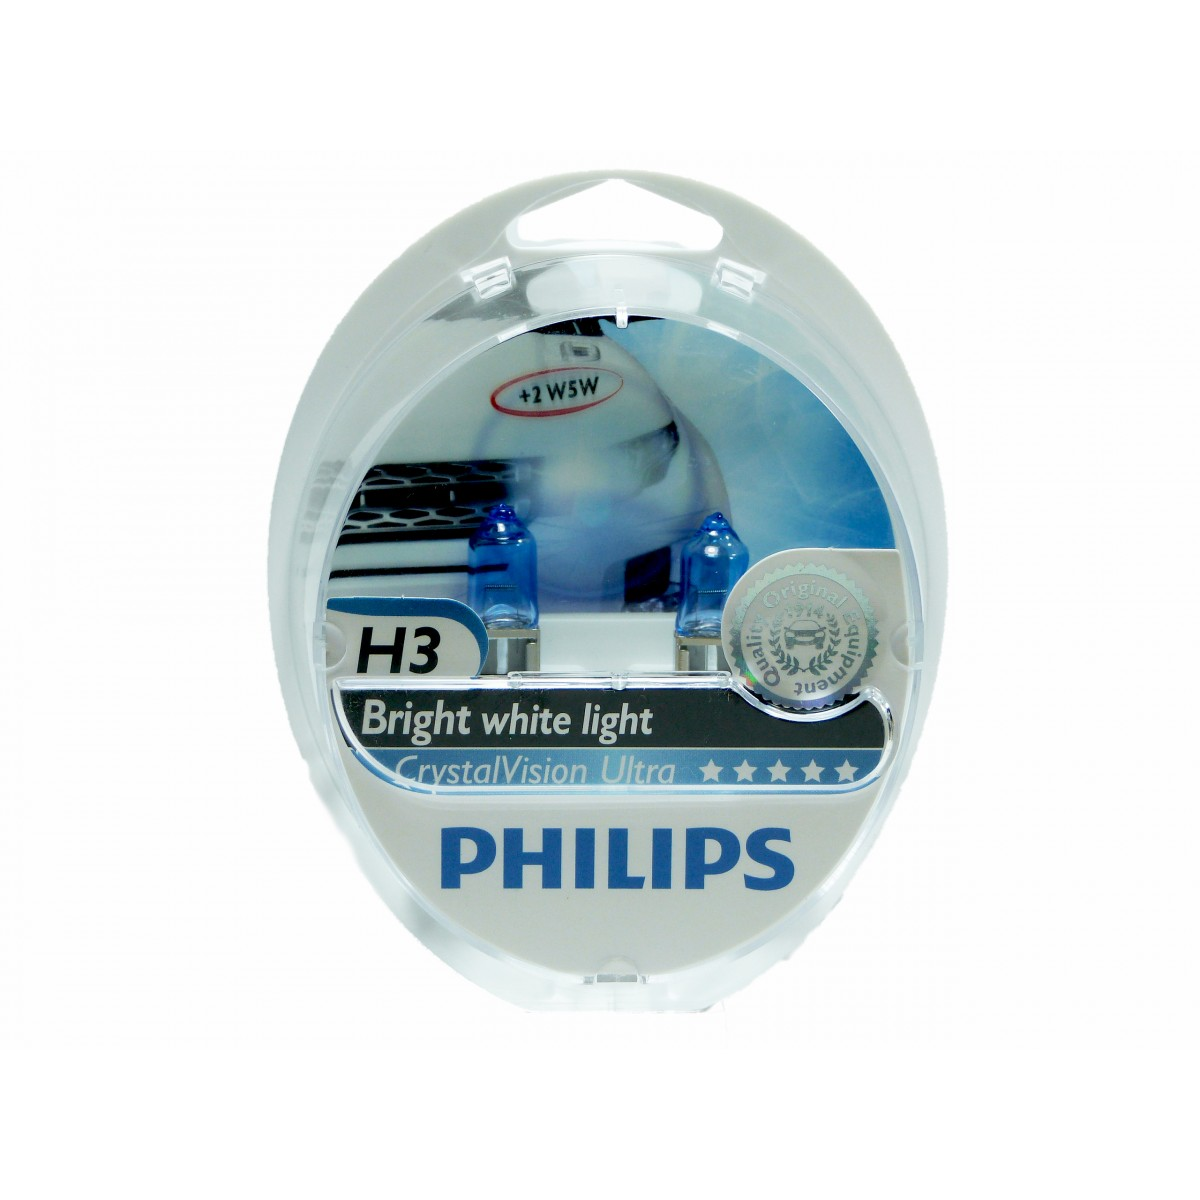 Kit Lampadas Philips Crystal Vision H3 Super Branca